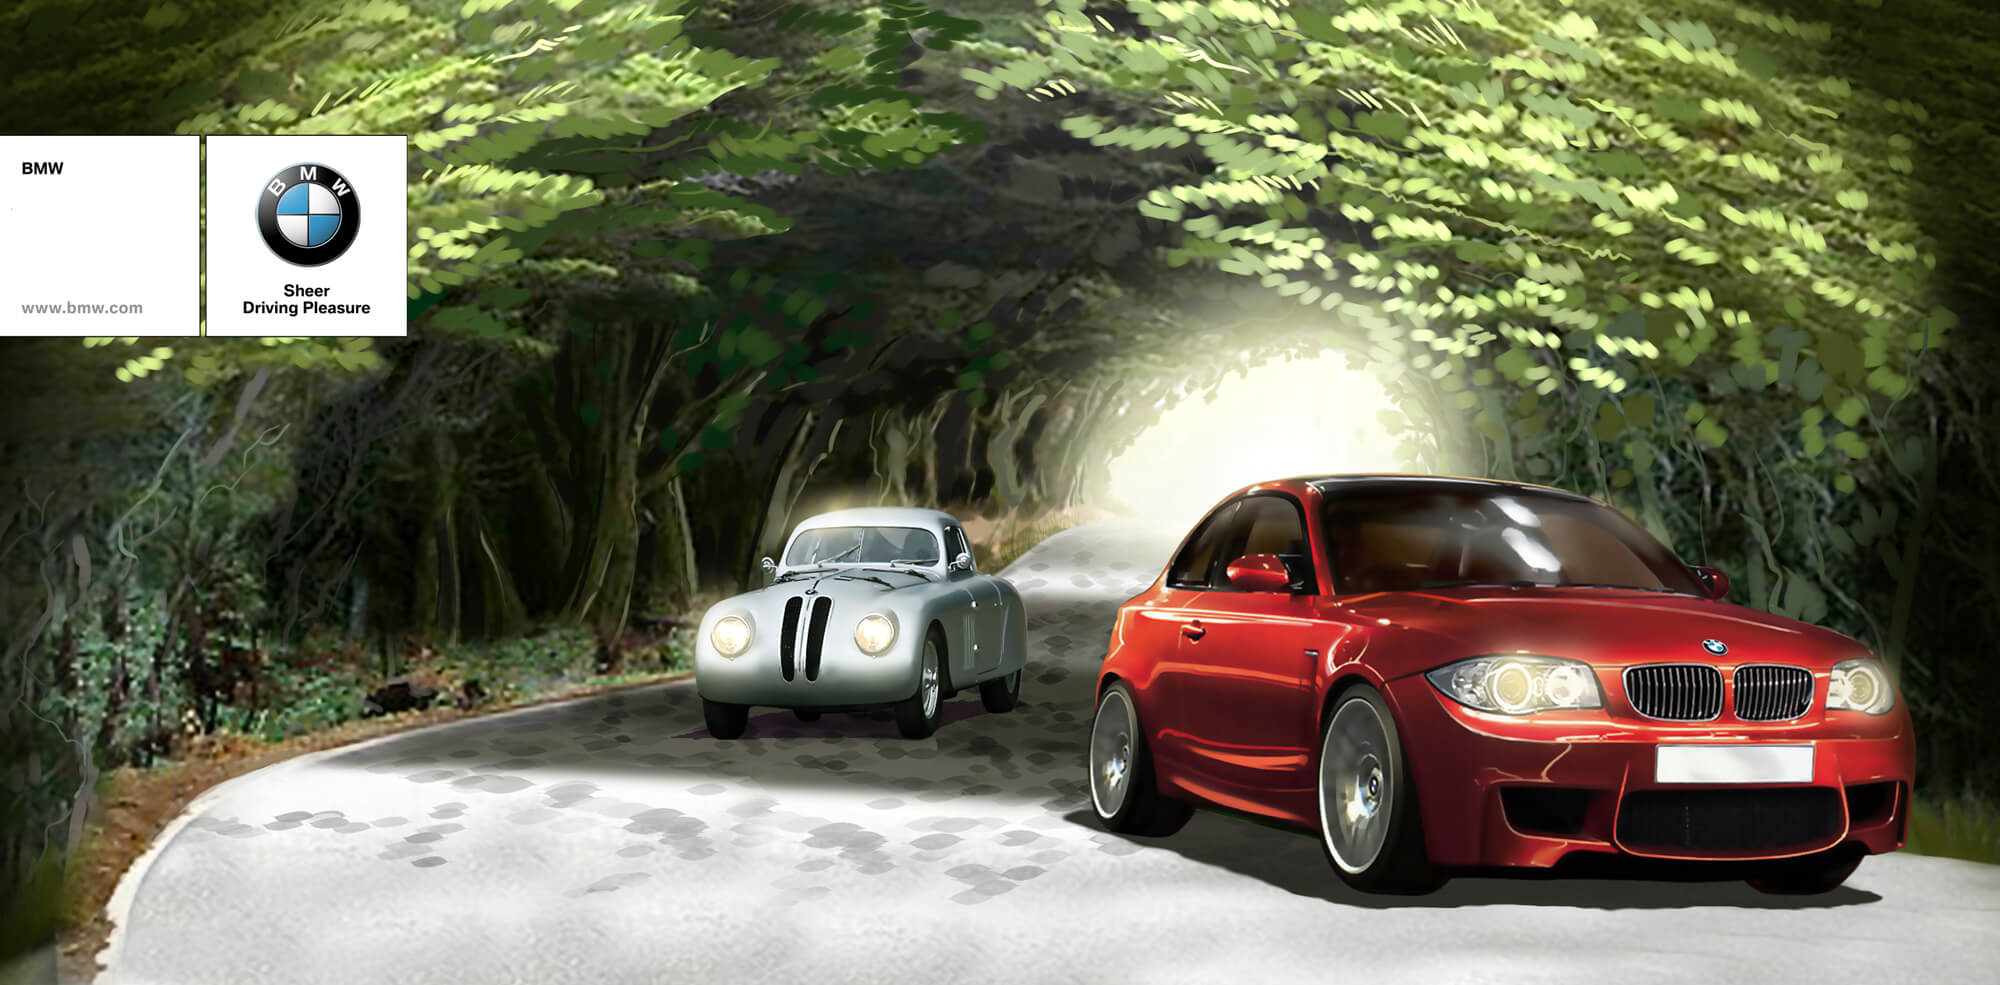 BMW_Print_Ads_4.jpg